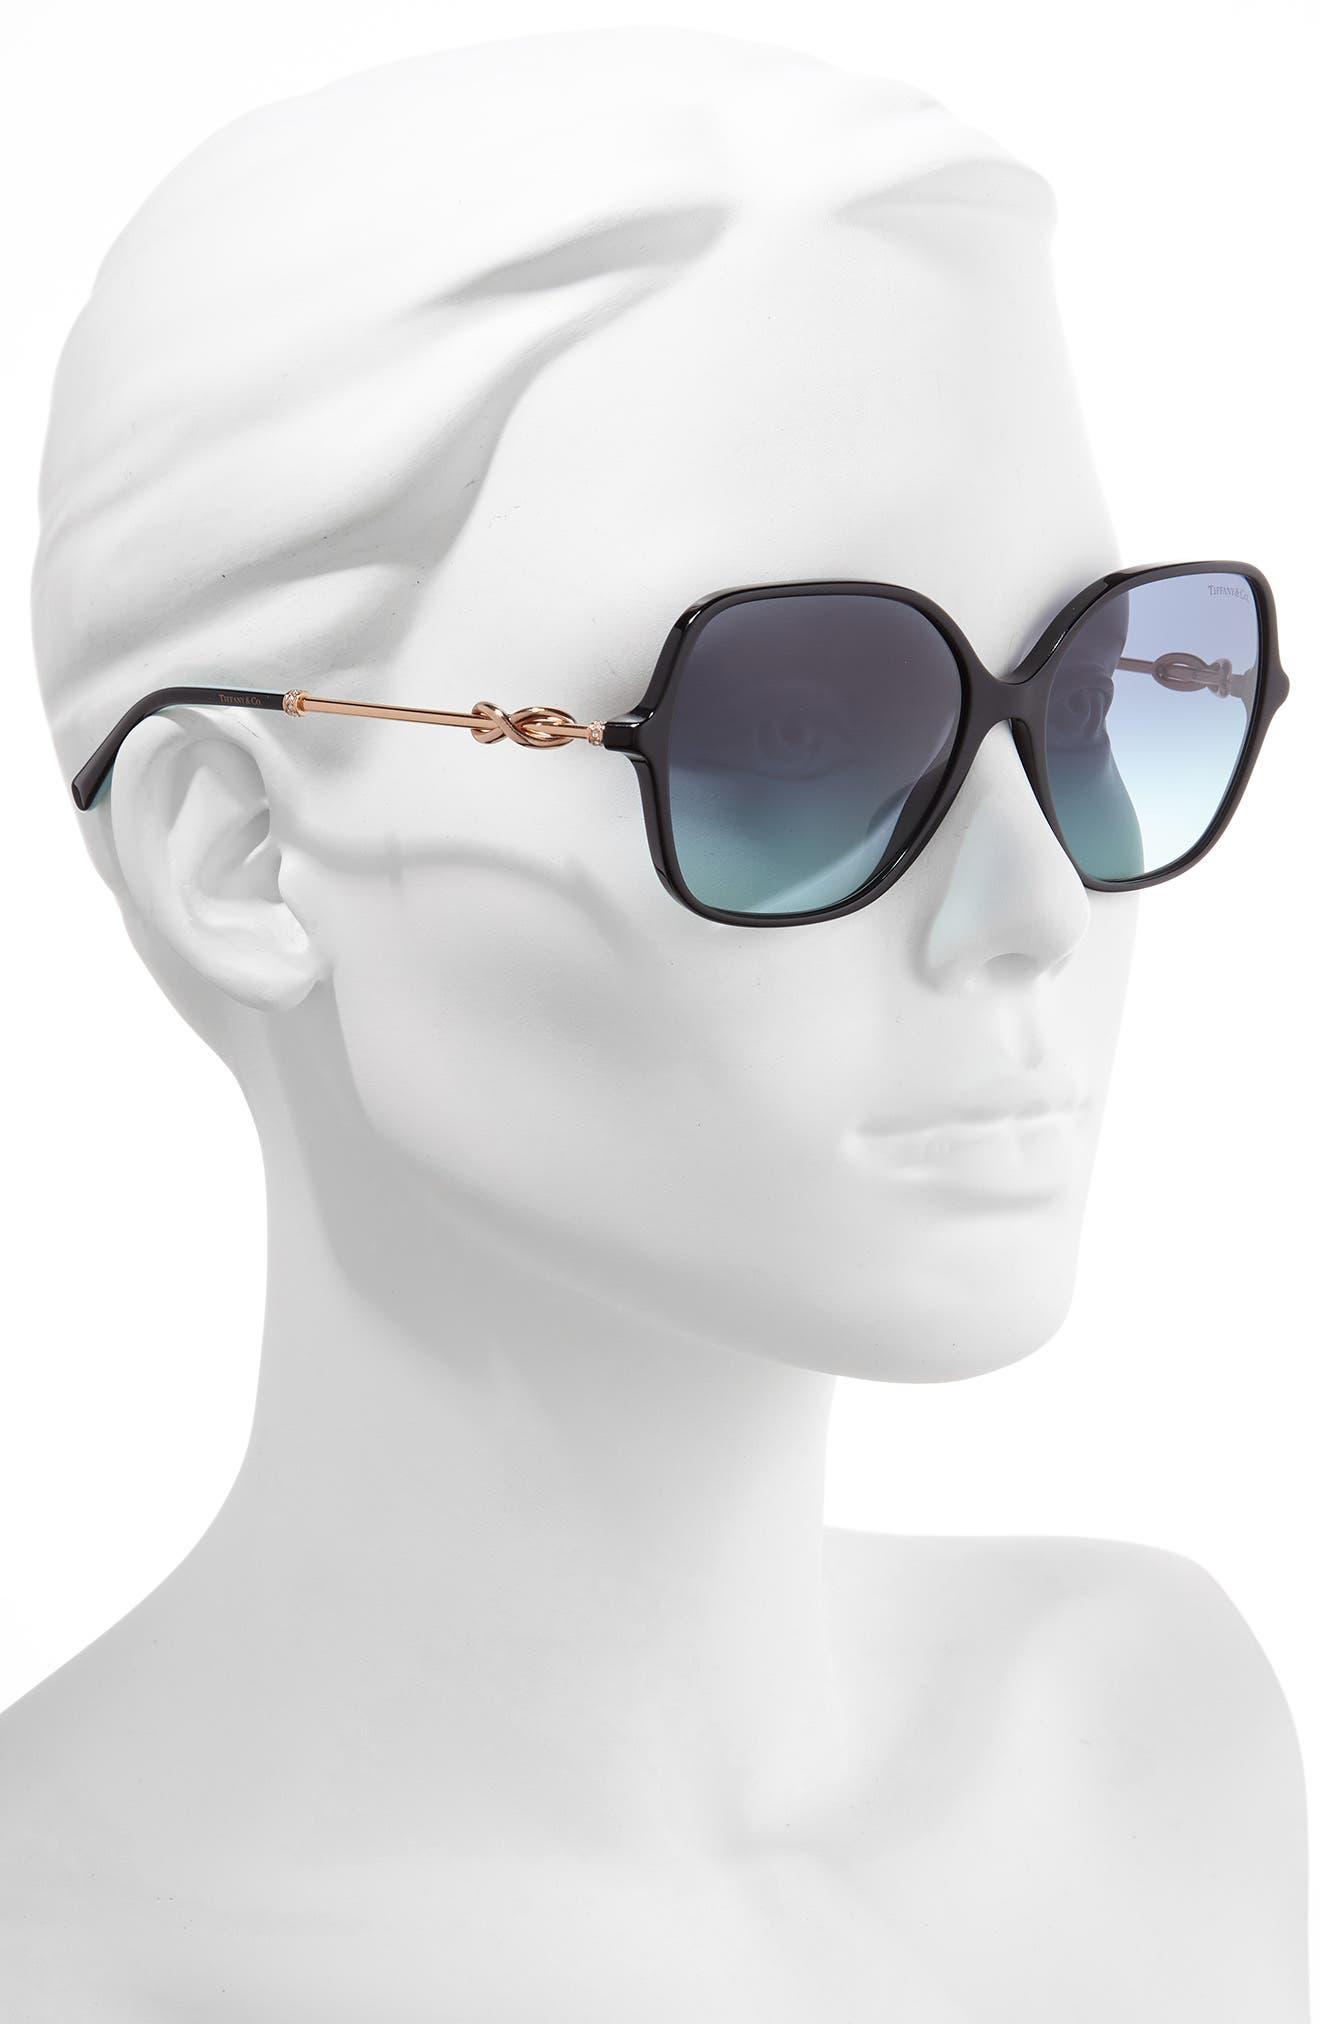 TIFFANY & CO., Tiffany 57mm Sunglasses, Alternate thumbnail 2, color, BLACK/ AZURE GRADIENT